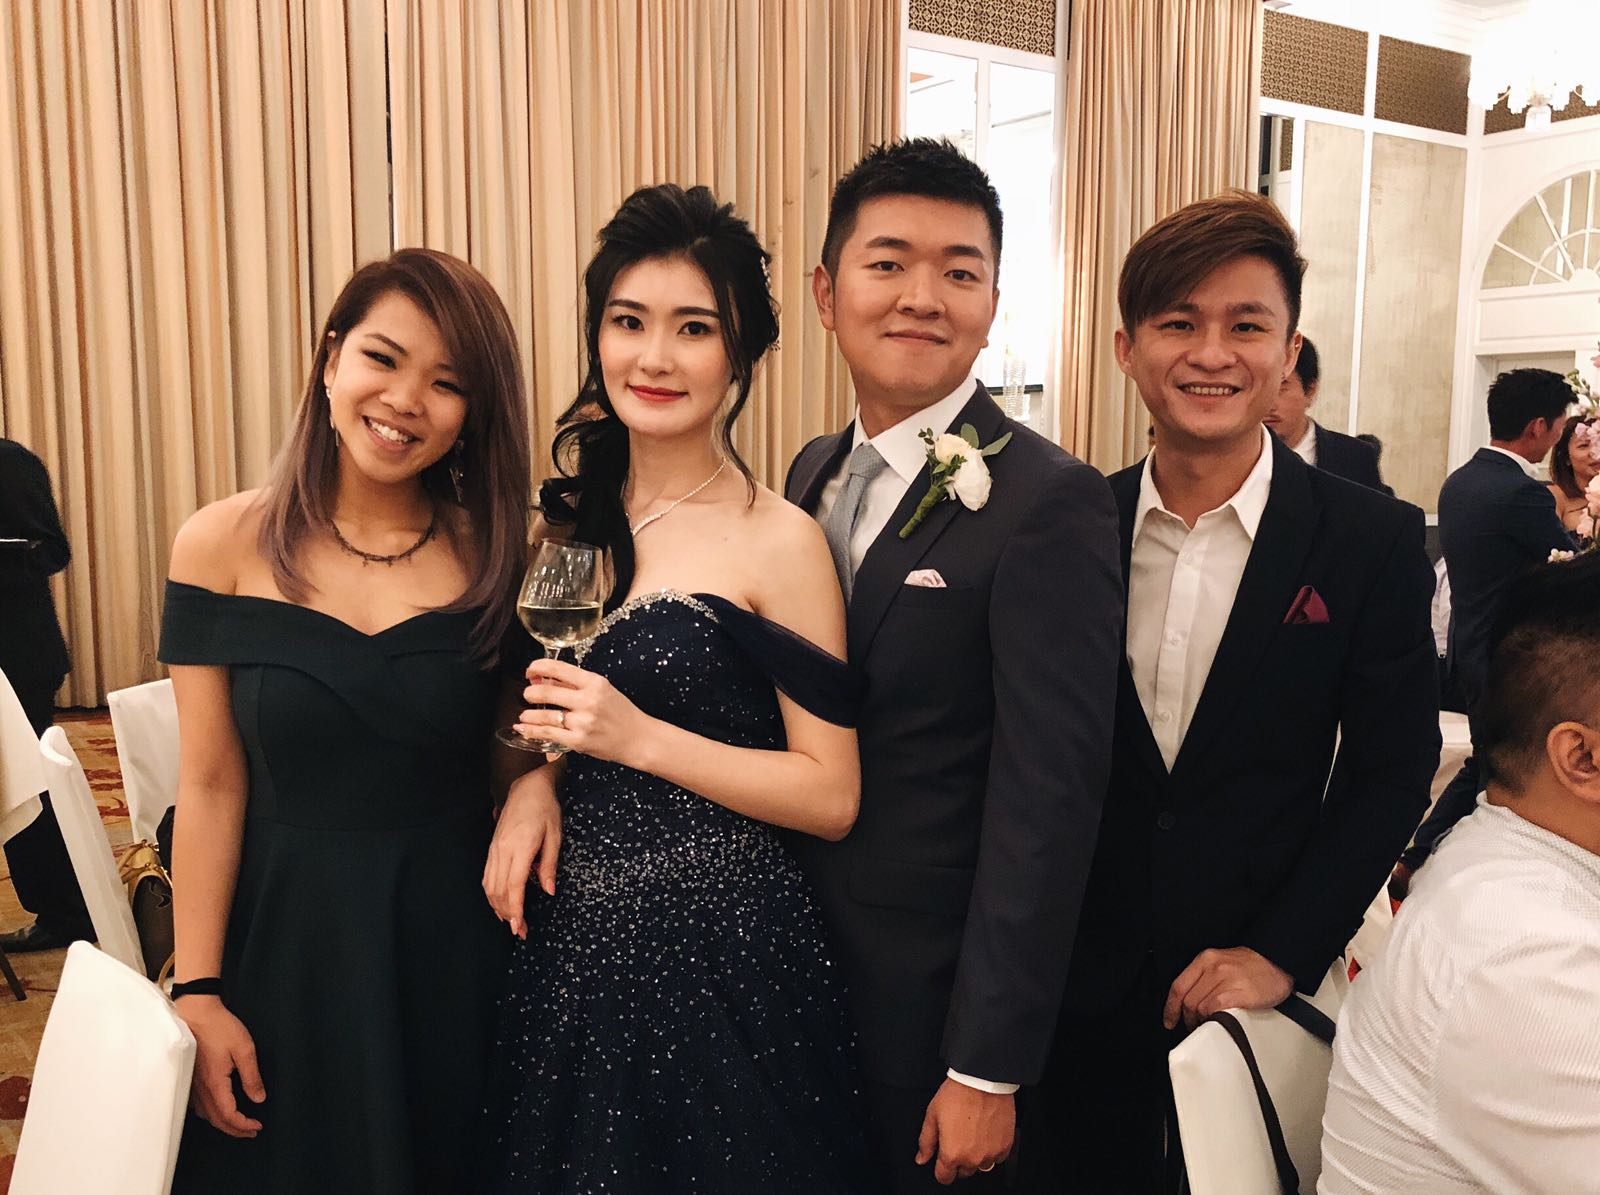 ZhongYuan & Cecilia's Wedding Dinner